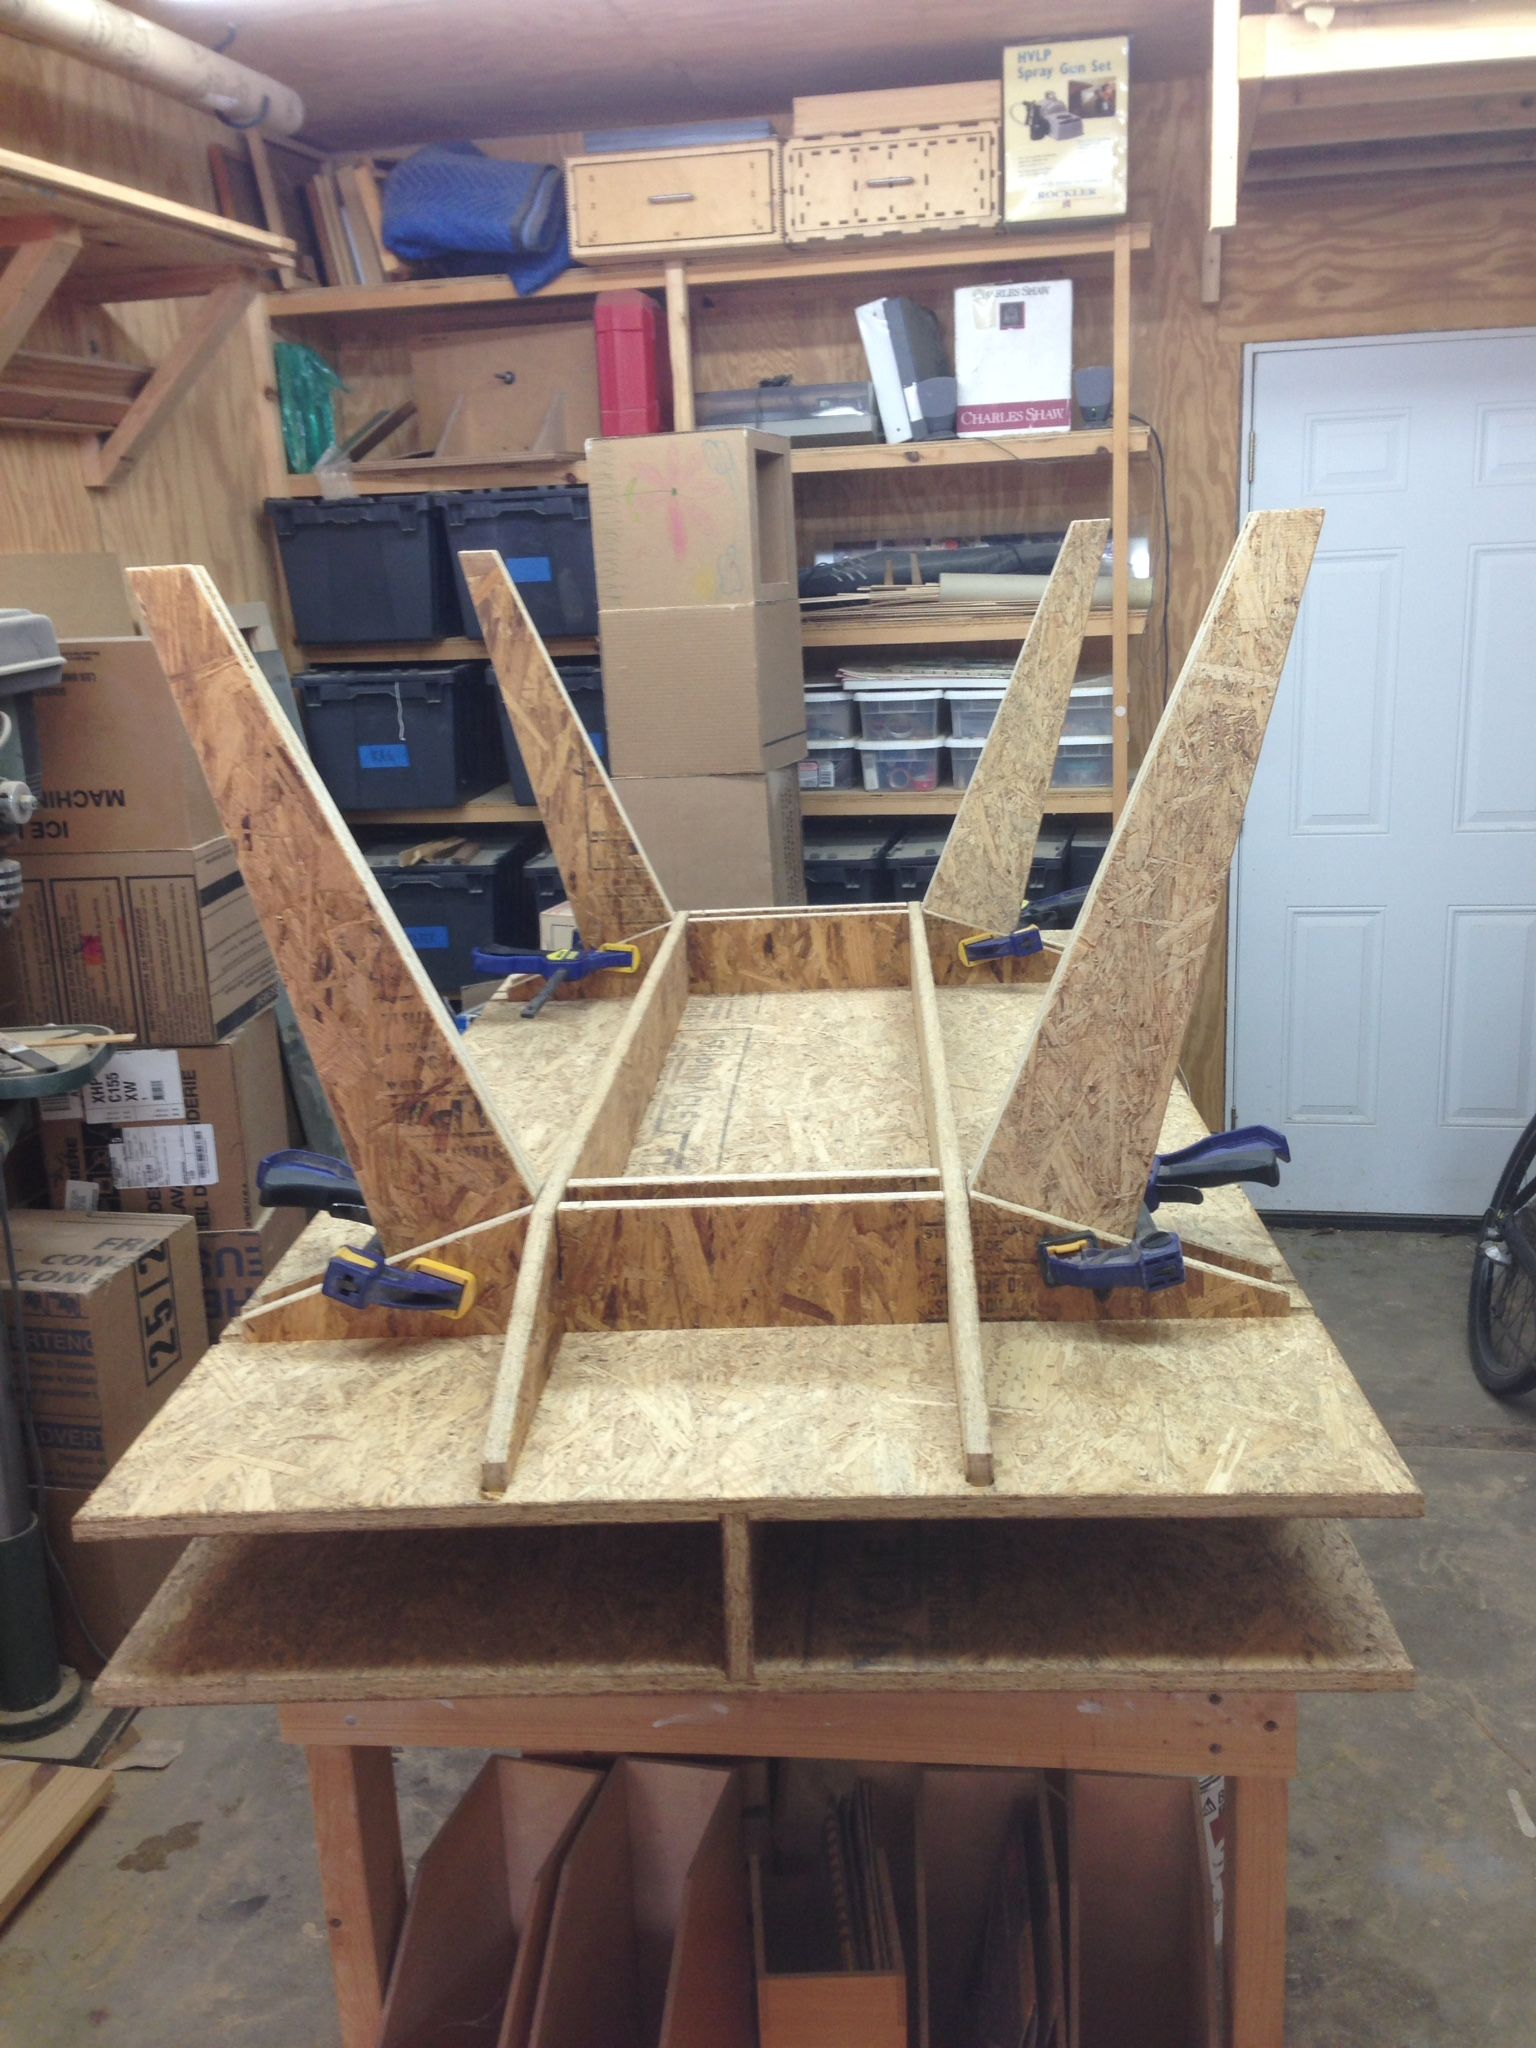 osb table wood diy osb pinterest woods woodworking and tables. Black Bedroom Furniture Sets. Home Design Ideas